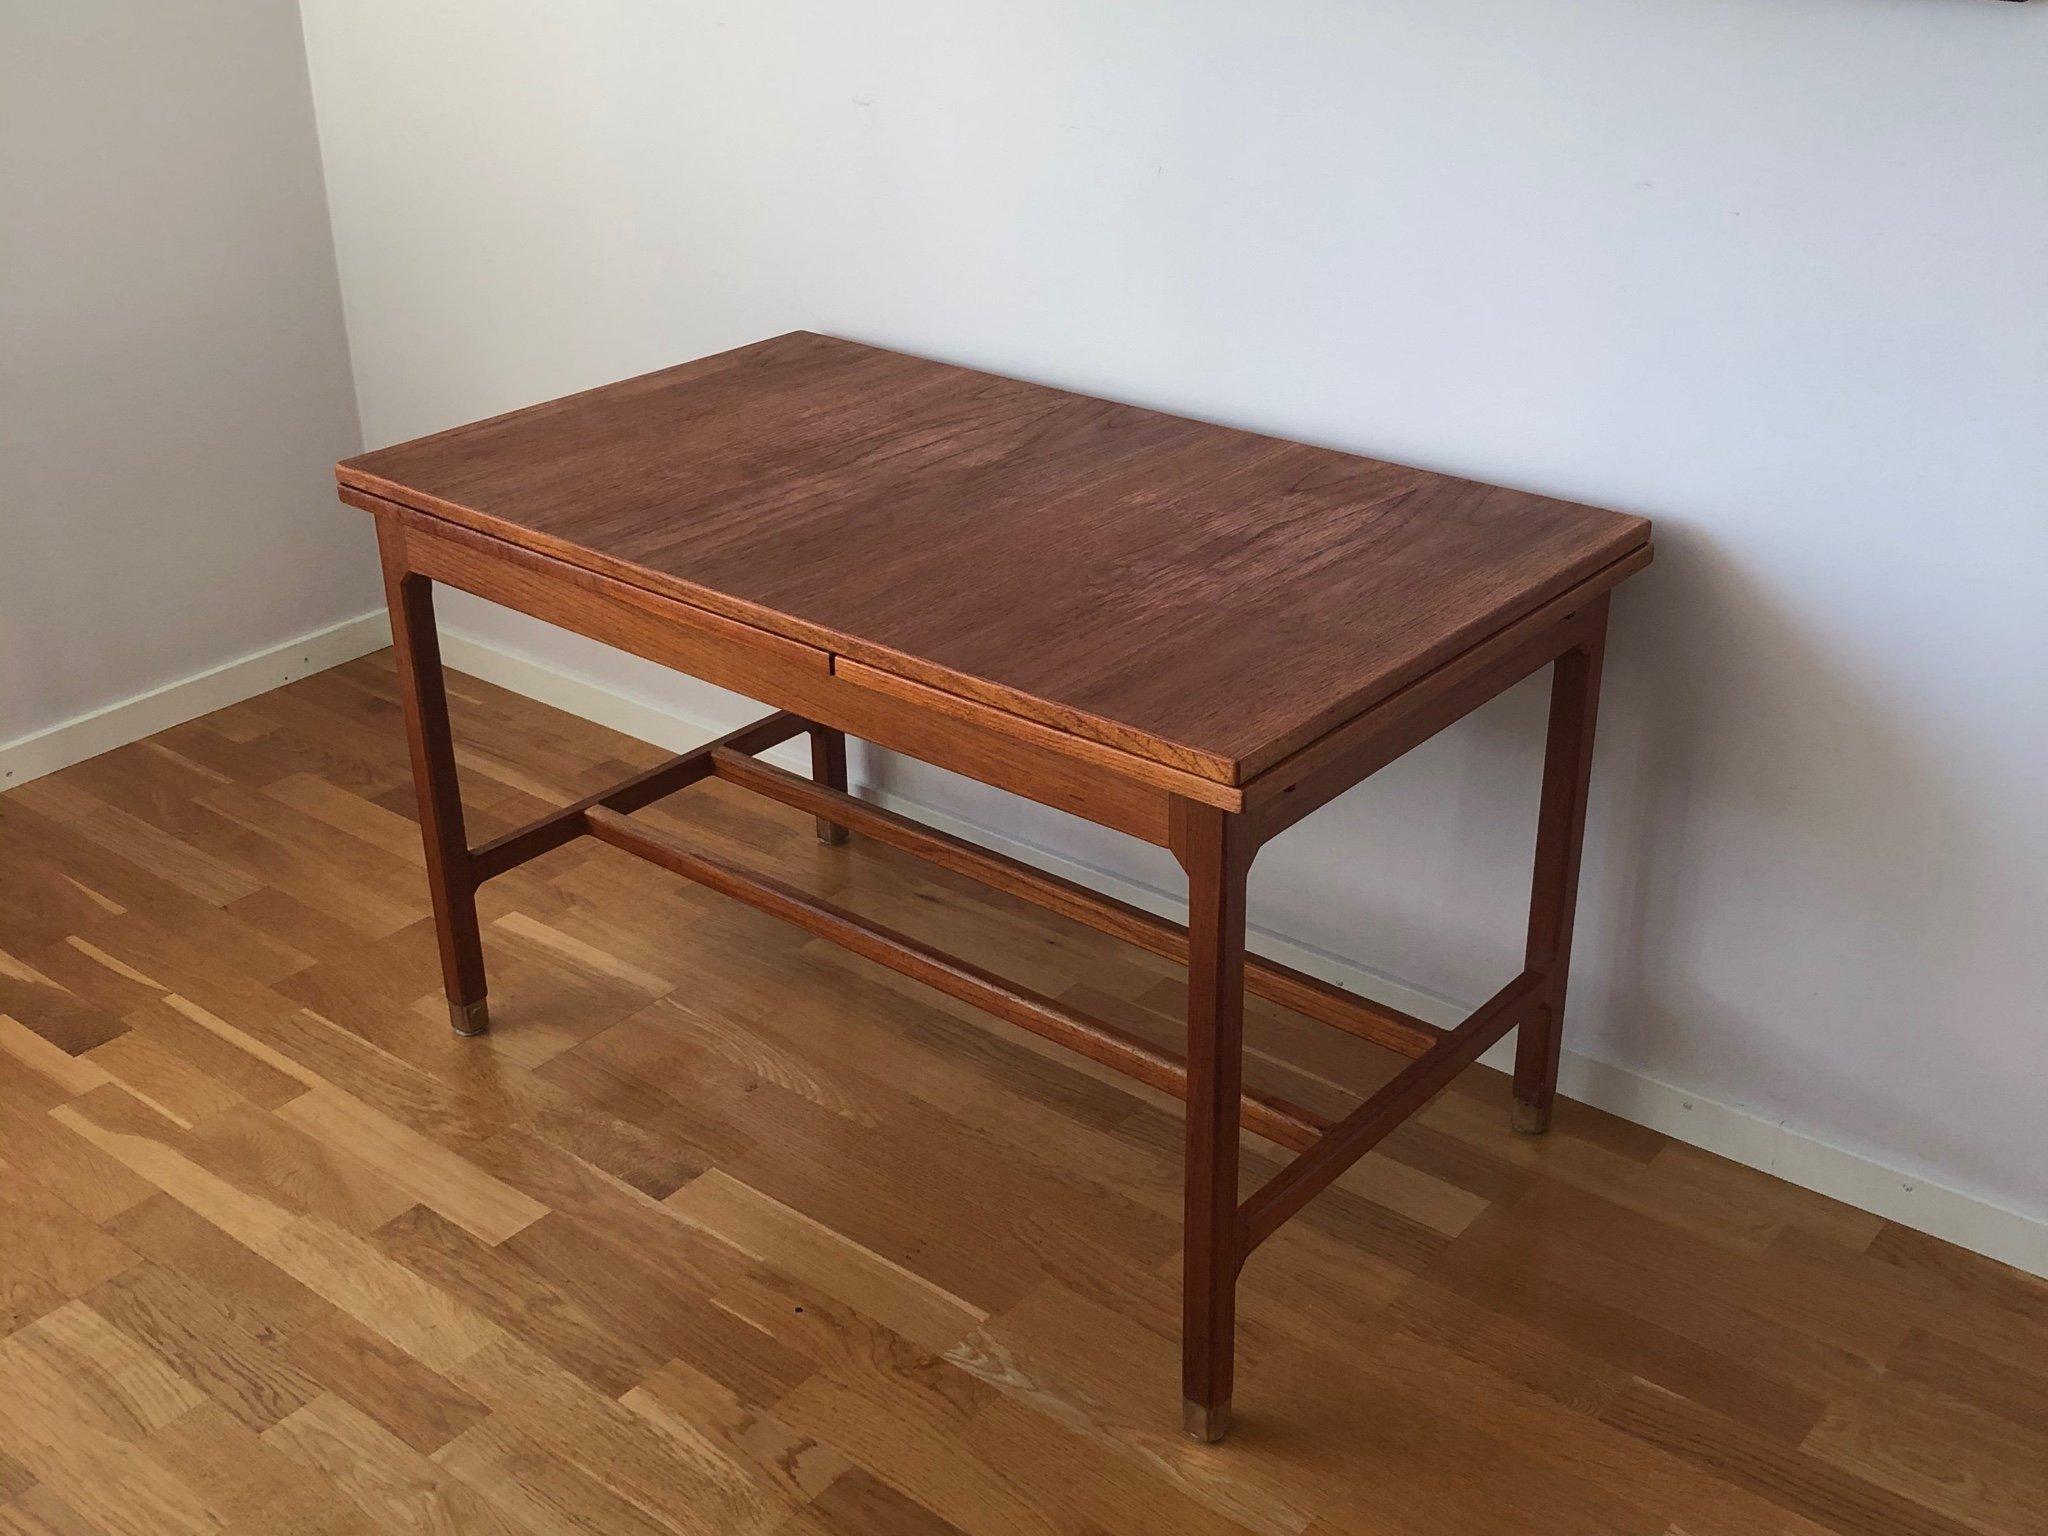 Soffbord Teak Ellbe Patent 195060 Tal Mobler Bord